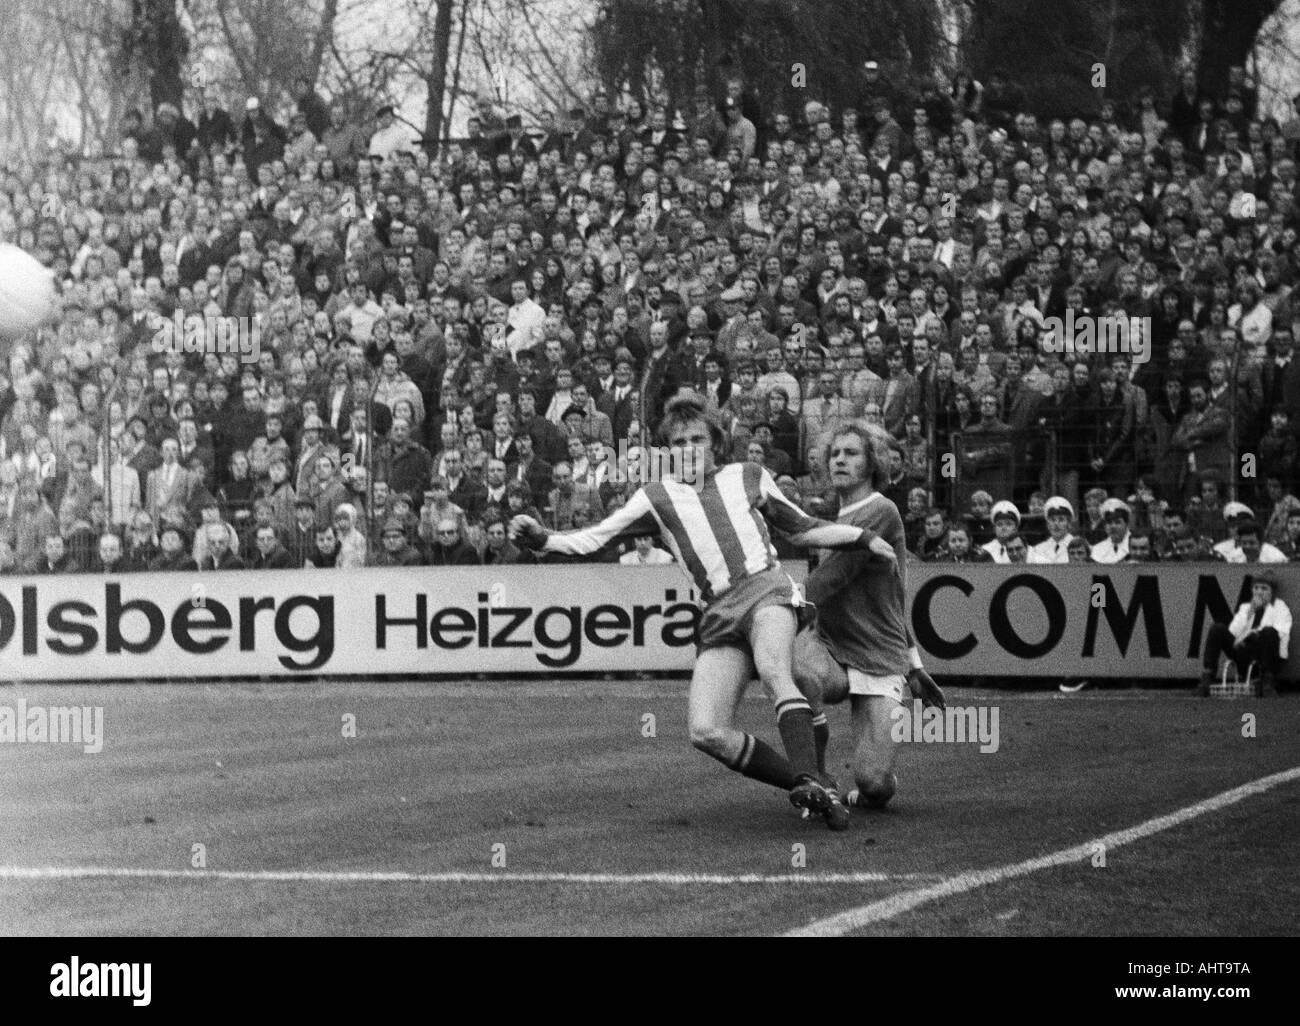 football, Bundesliga, 1971/1972, FC Schalke 04 versus 1. FC Kaiserslautern 3:0, Stadium Glueckaufkampfbahn in Gelsenkirchen, scene of the match, duel between Klaus Ackermann (FCK) left and Juergen Sobieray (S04) - Stock Image